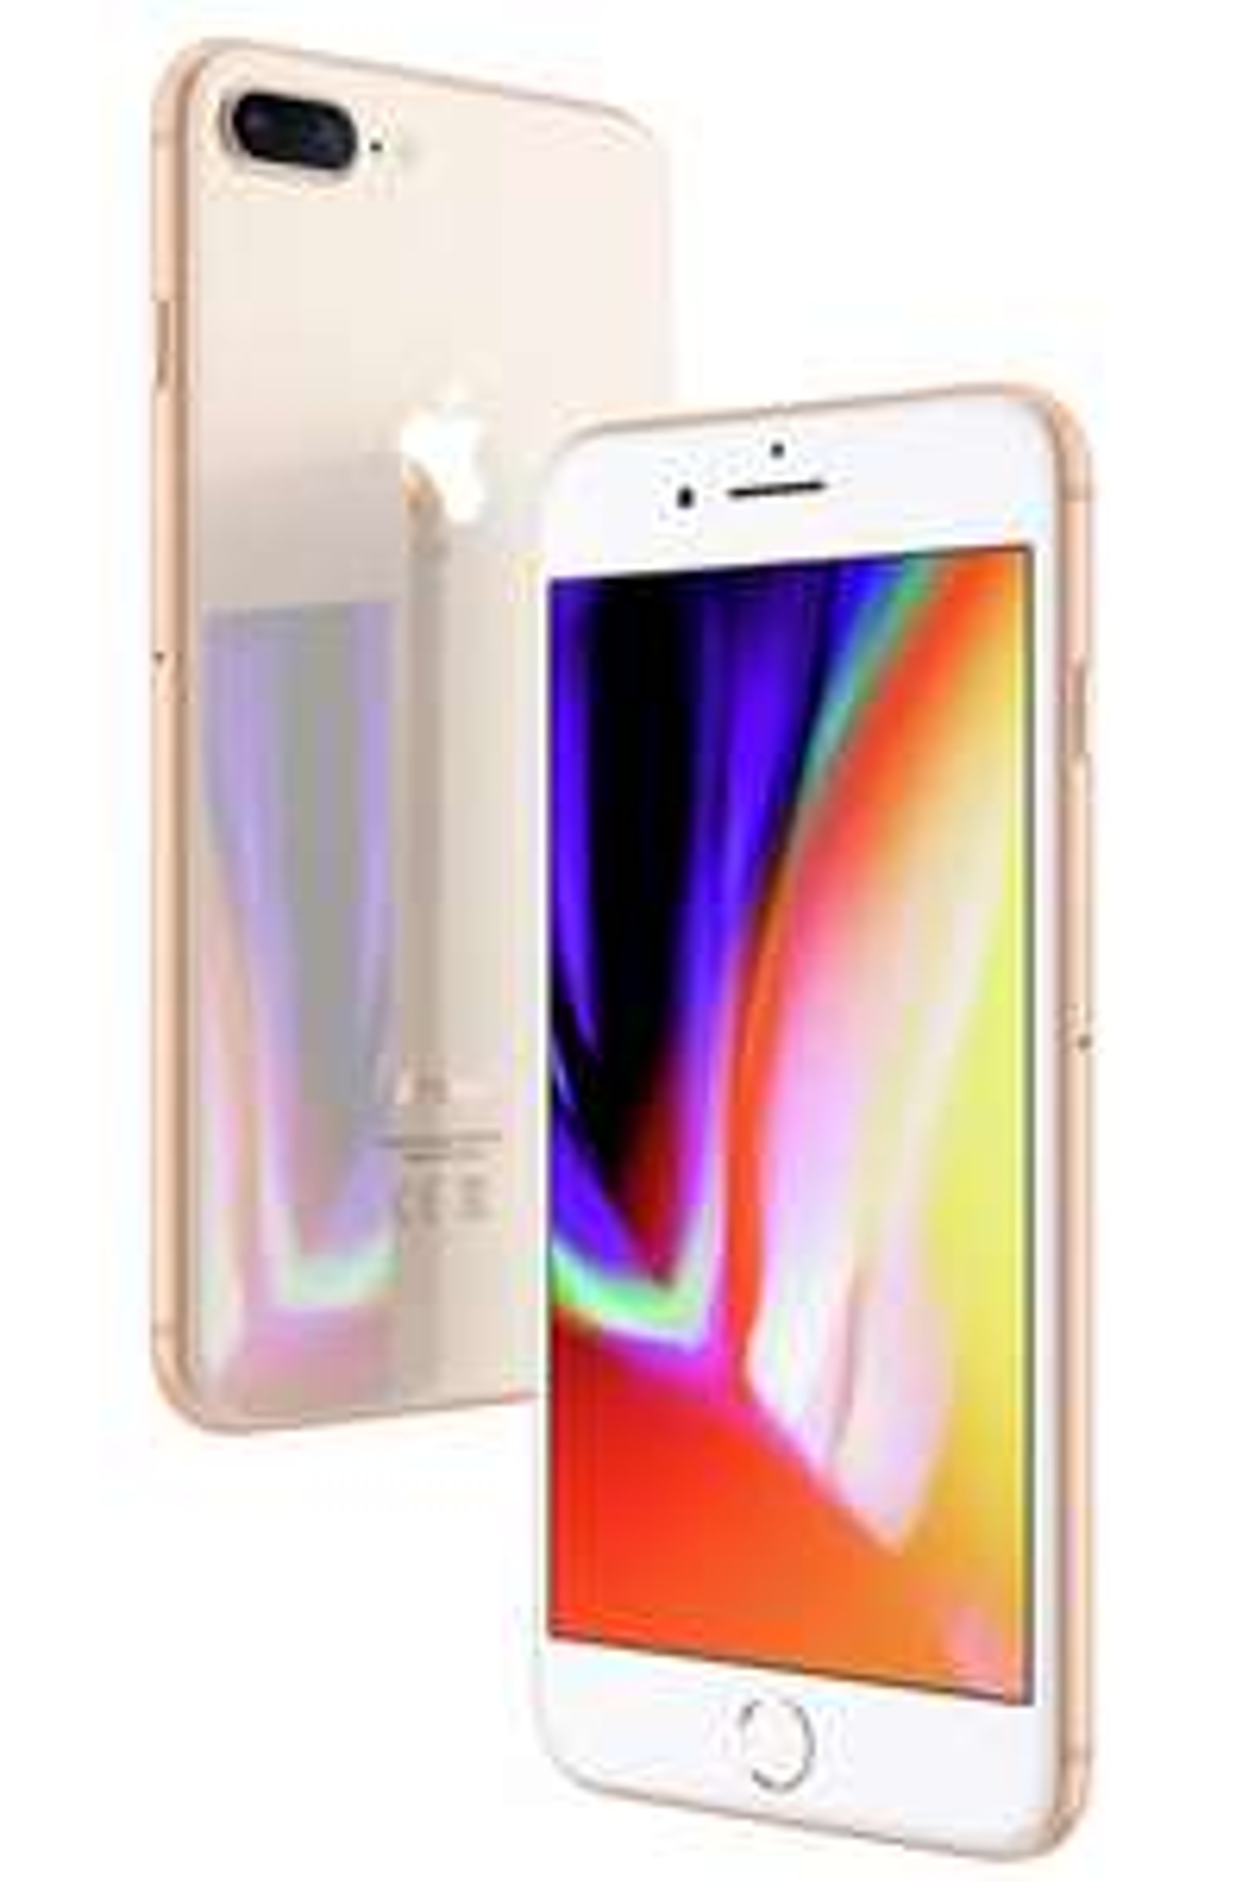 Apple iPhone 8 Plus - 64GB - Unlocked / SIM Free - GOLD - Grade A - 12M Warranty - Argos eBay - £455.99